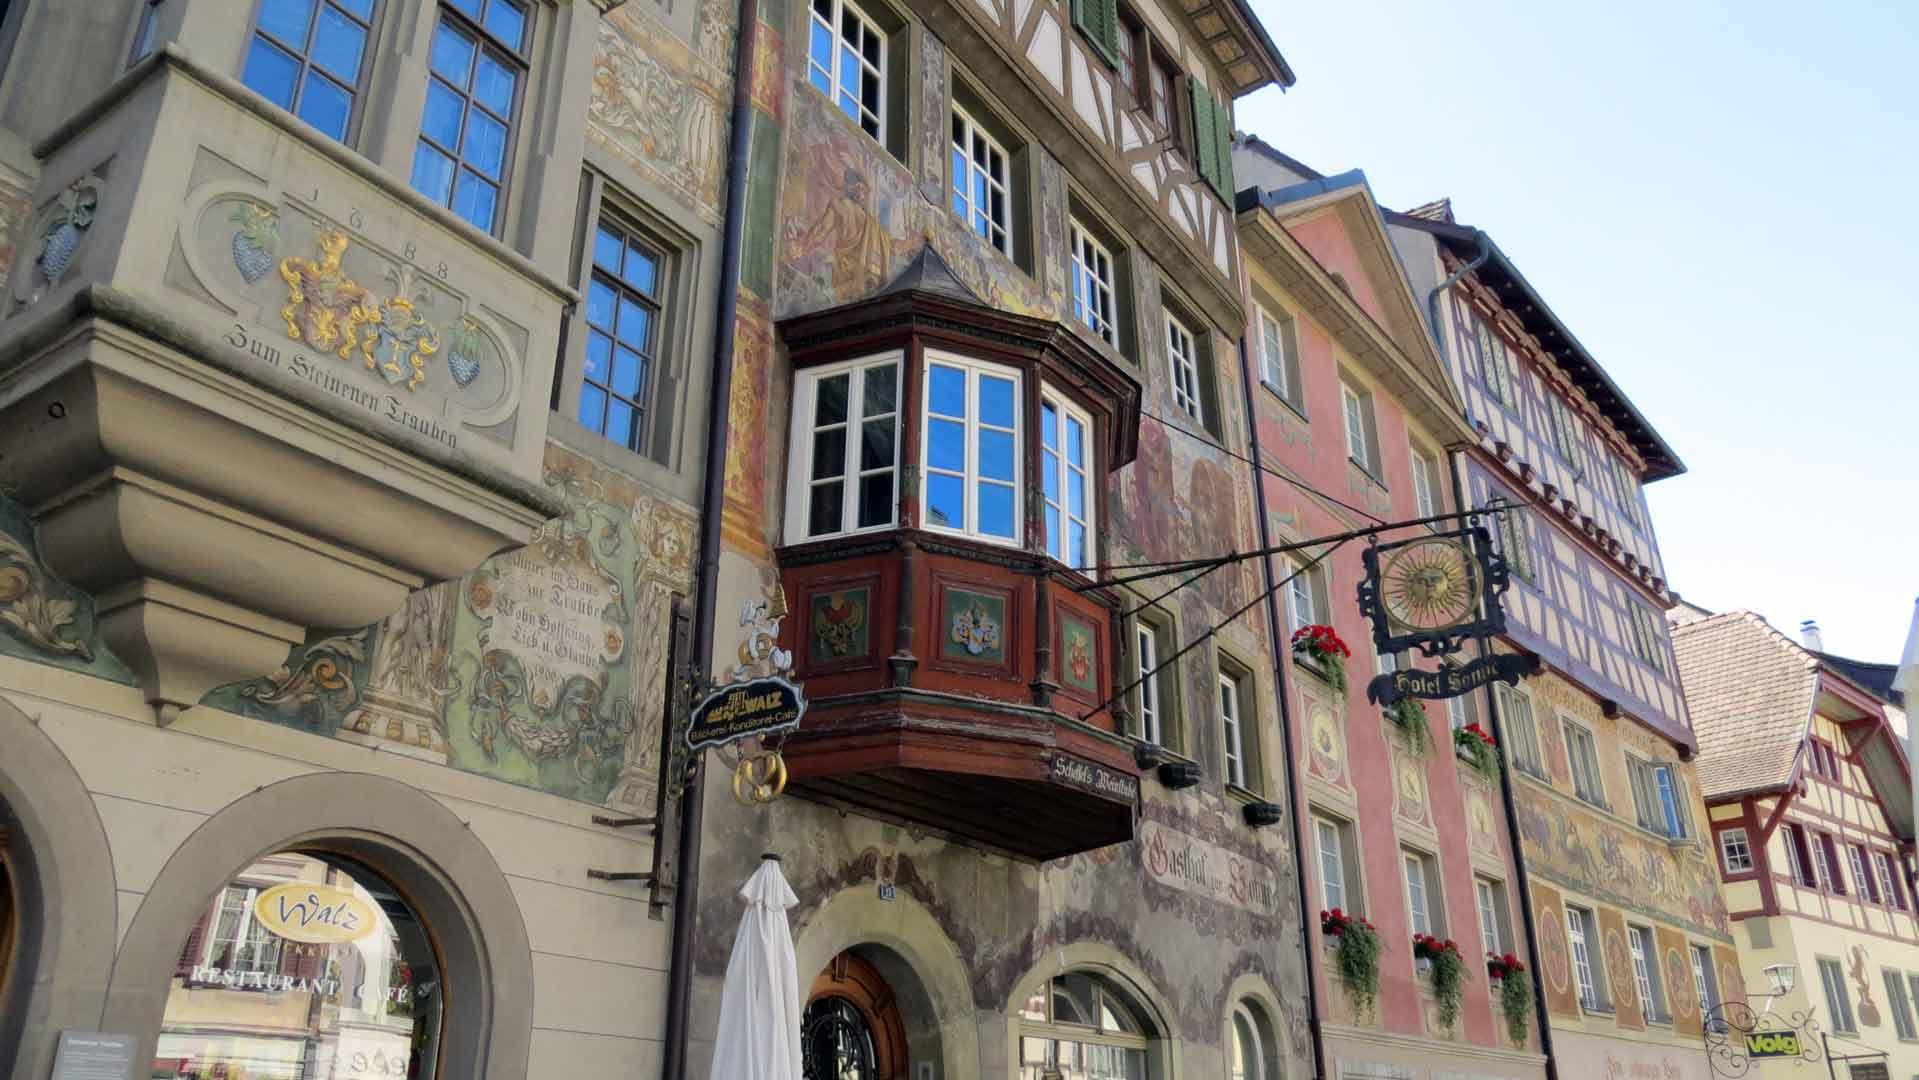 In Stein am Rhein hebben veel huizen prachtige fresco`s.